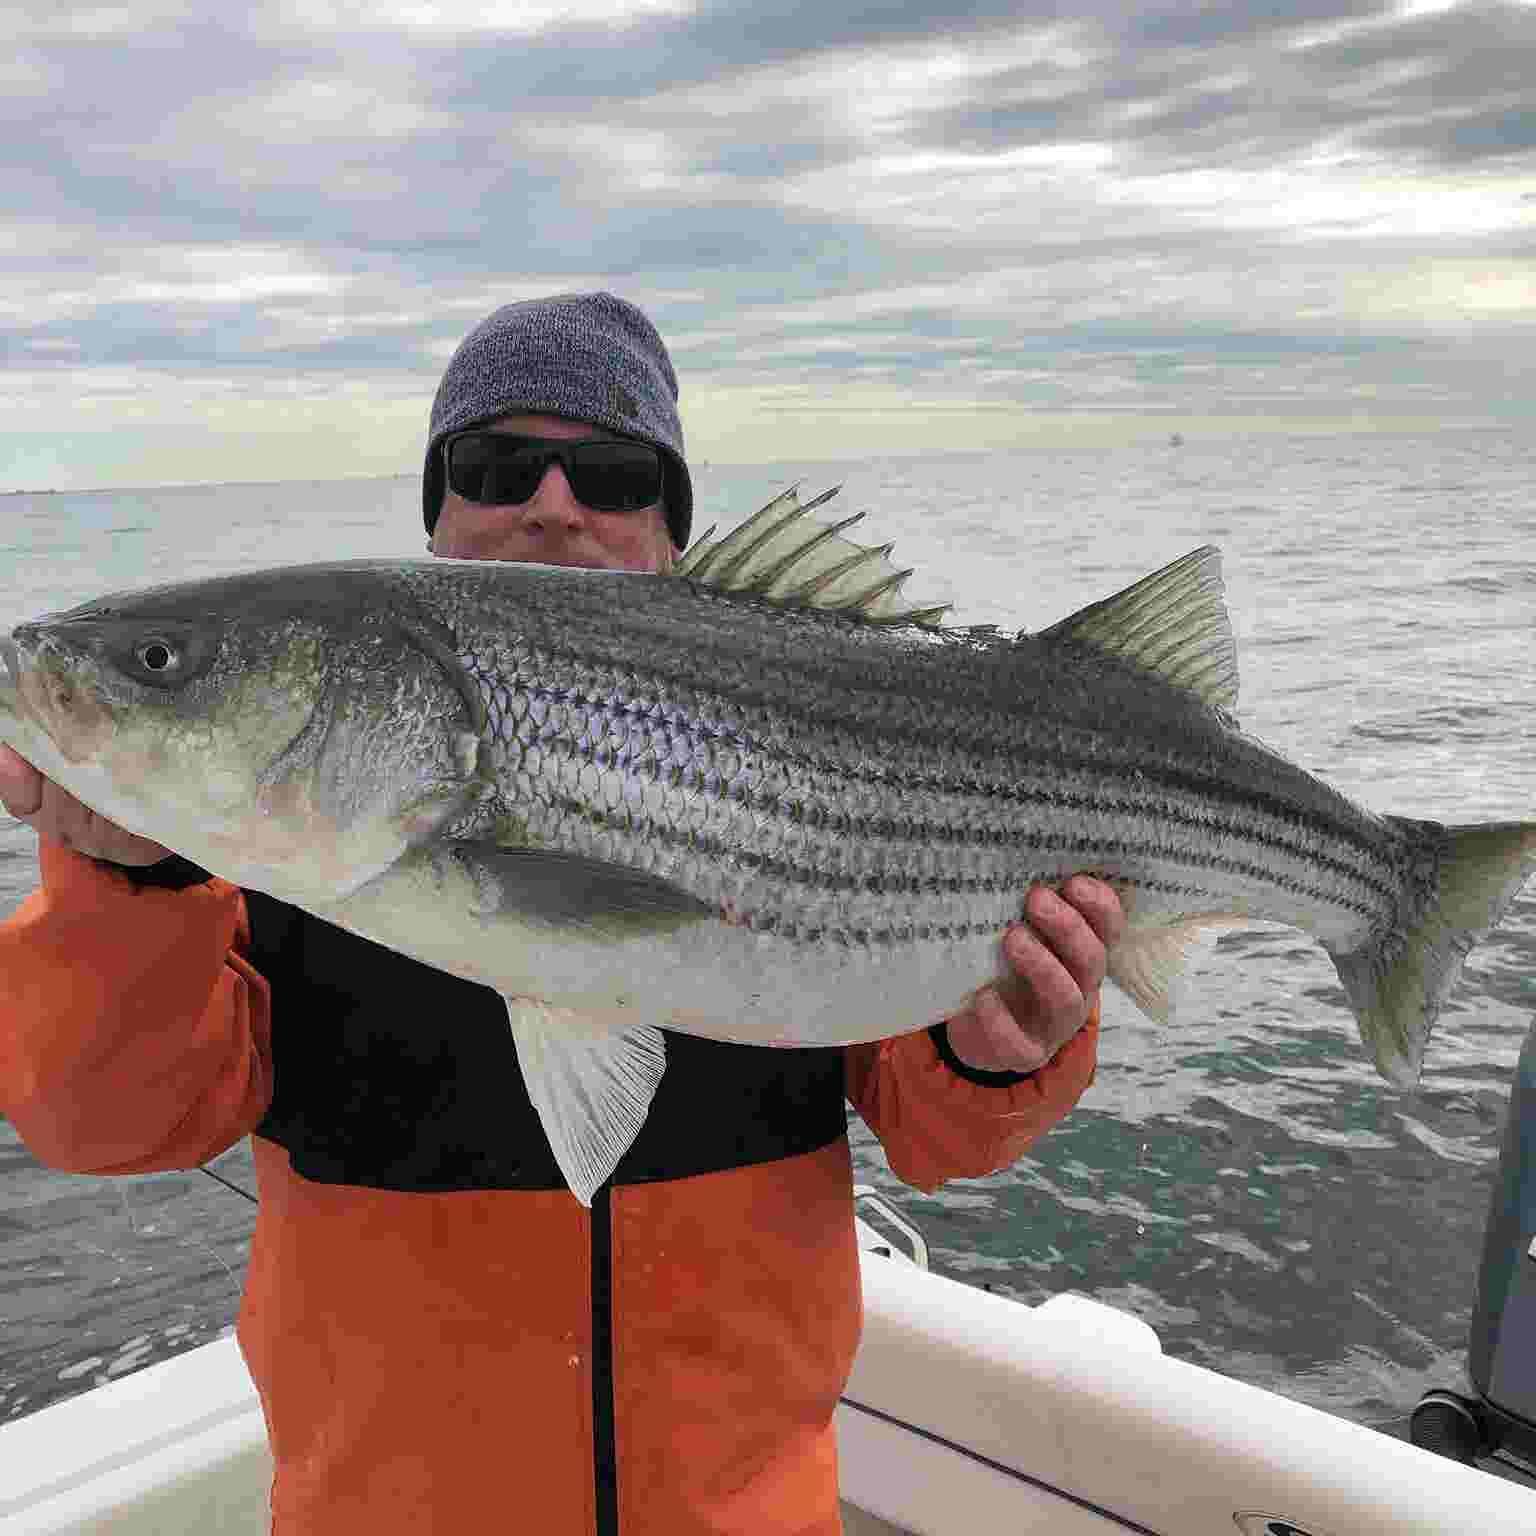 NJ spring 2019 striped bass run